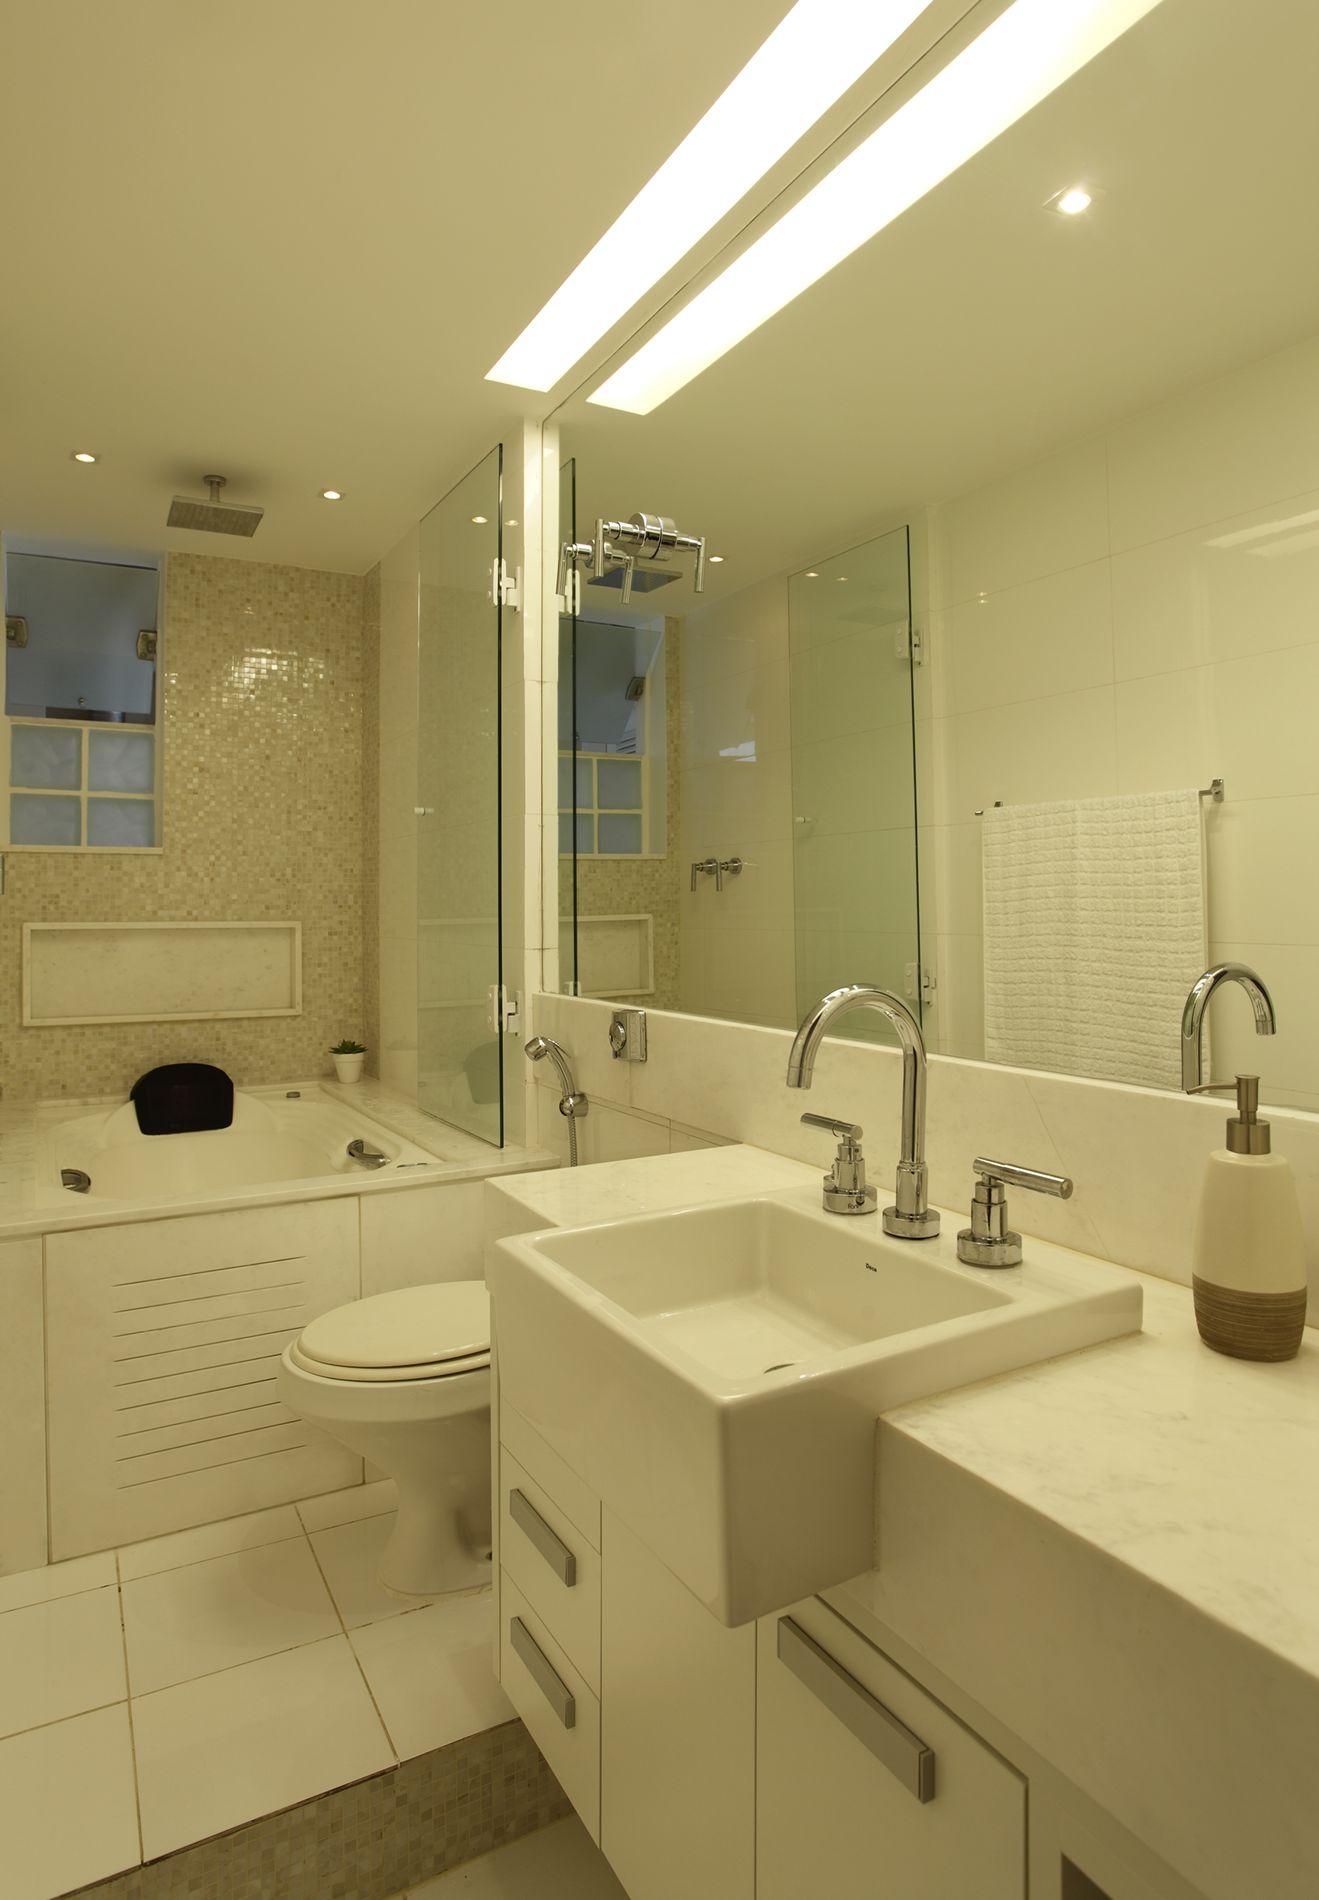 banheiros banheiros banheiros banheiros banheiros banheiros banheiros  #958836 1319 1900